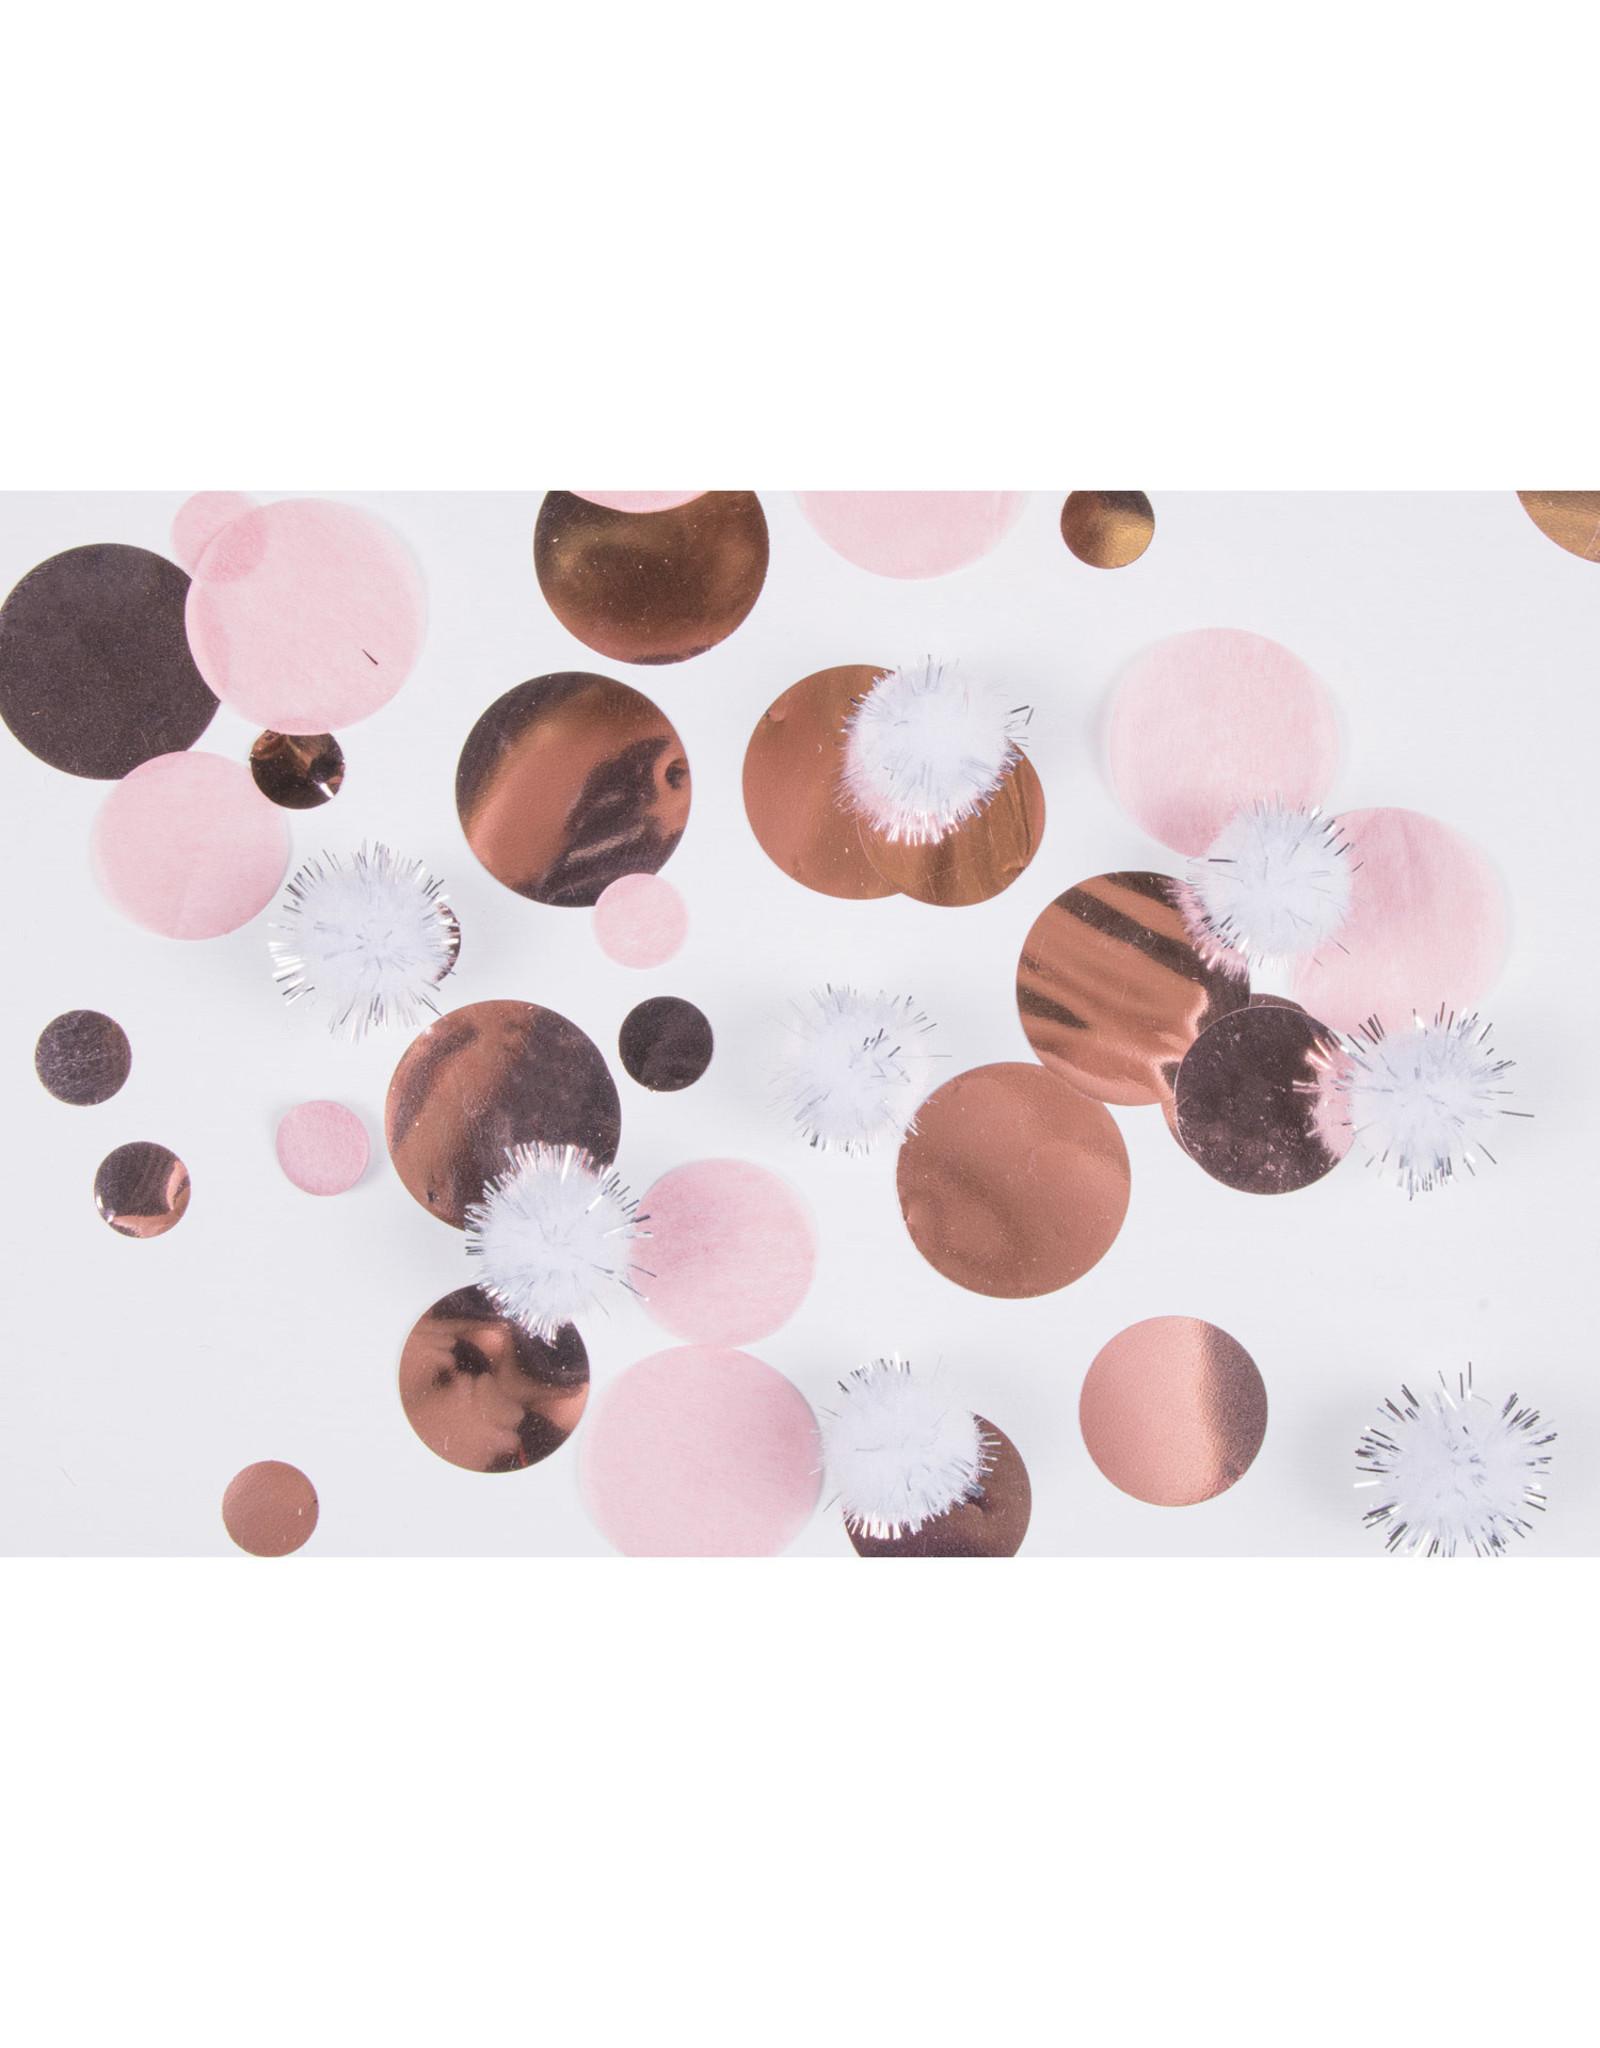 Amscan confetti rose goud/roze mix 12 gram